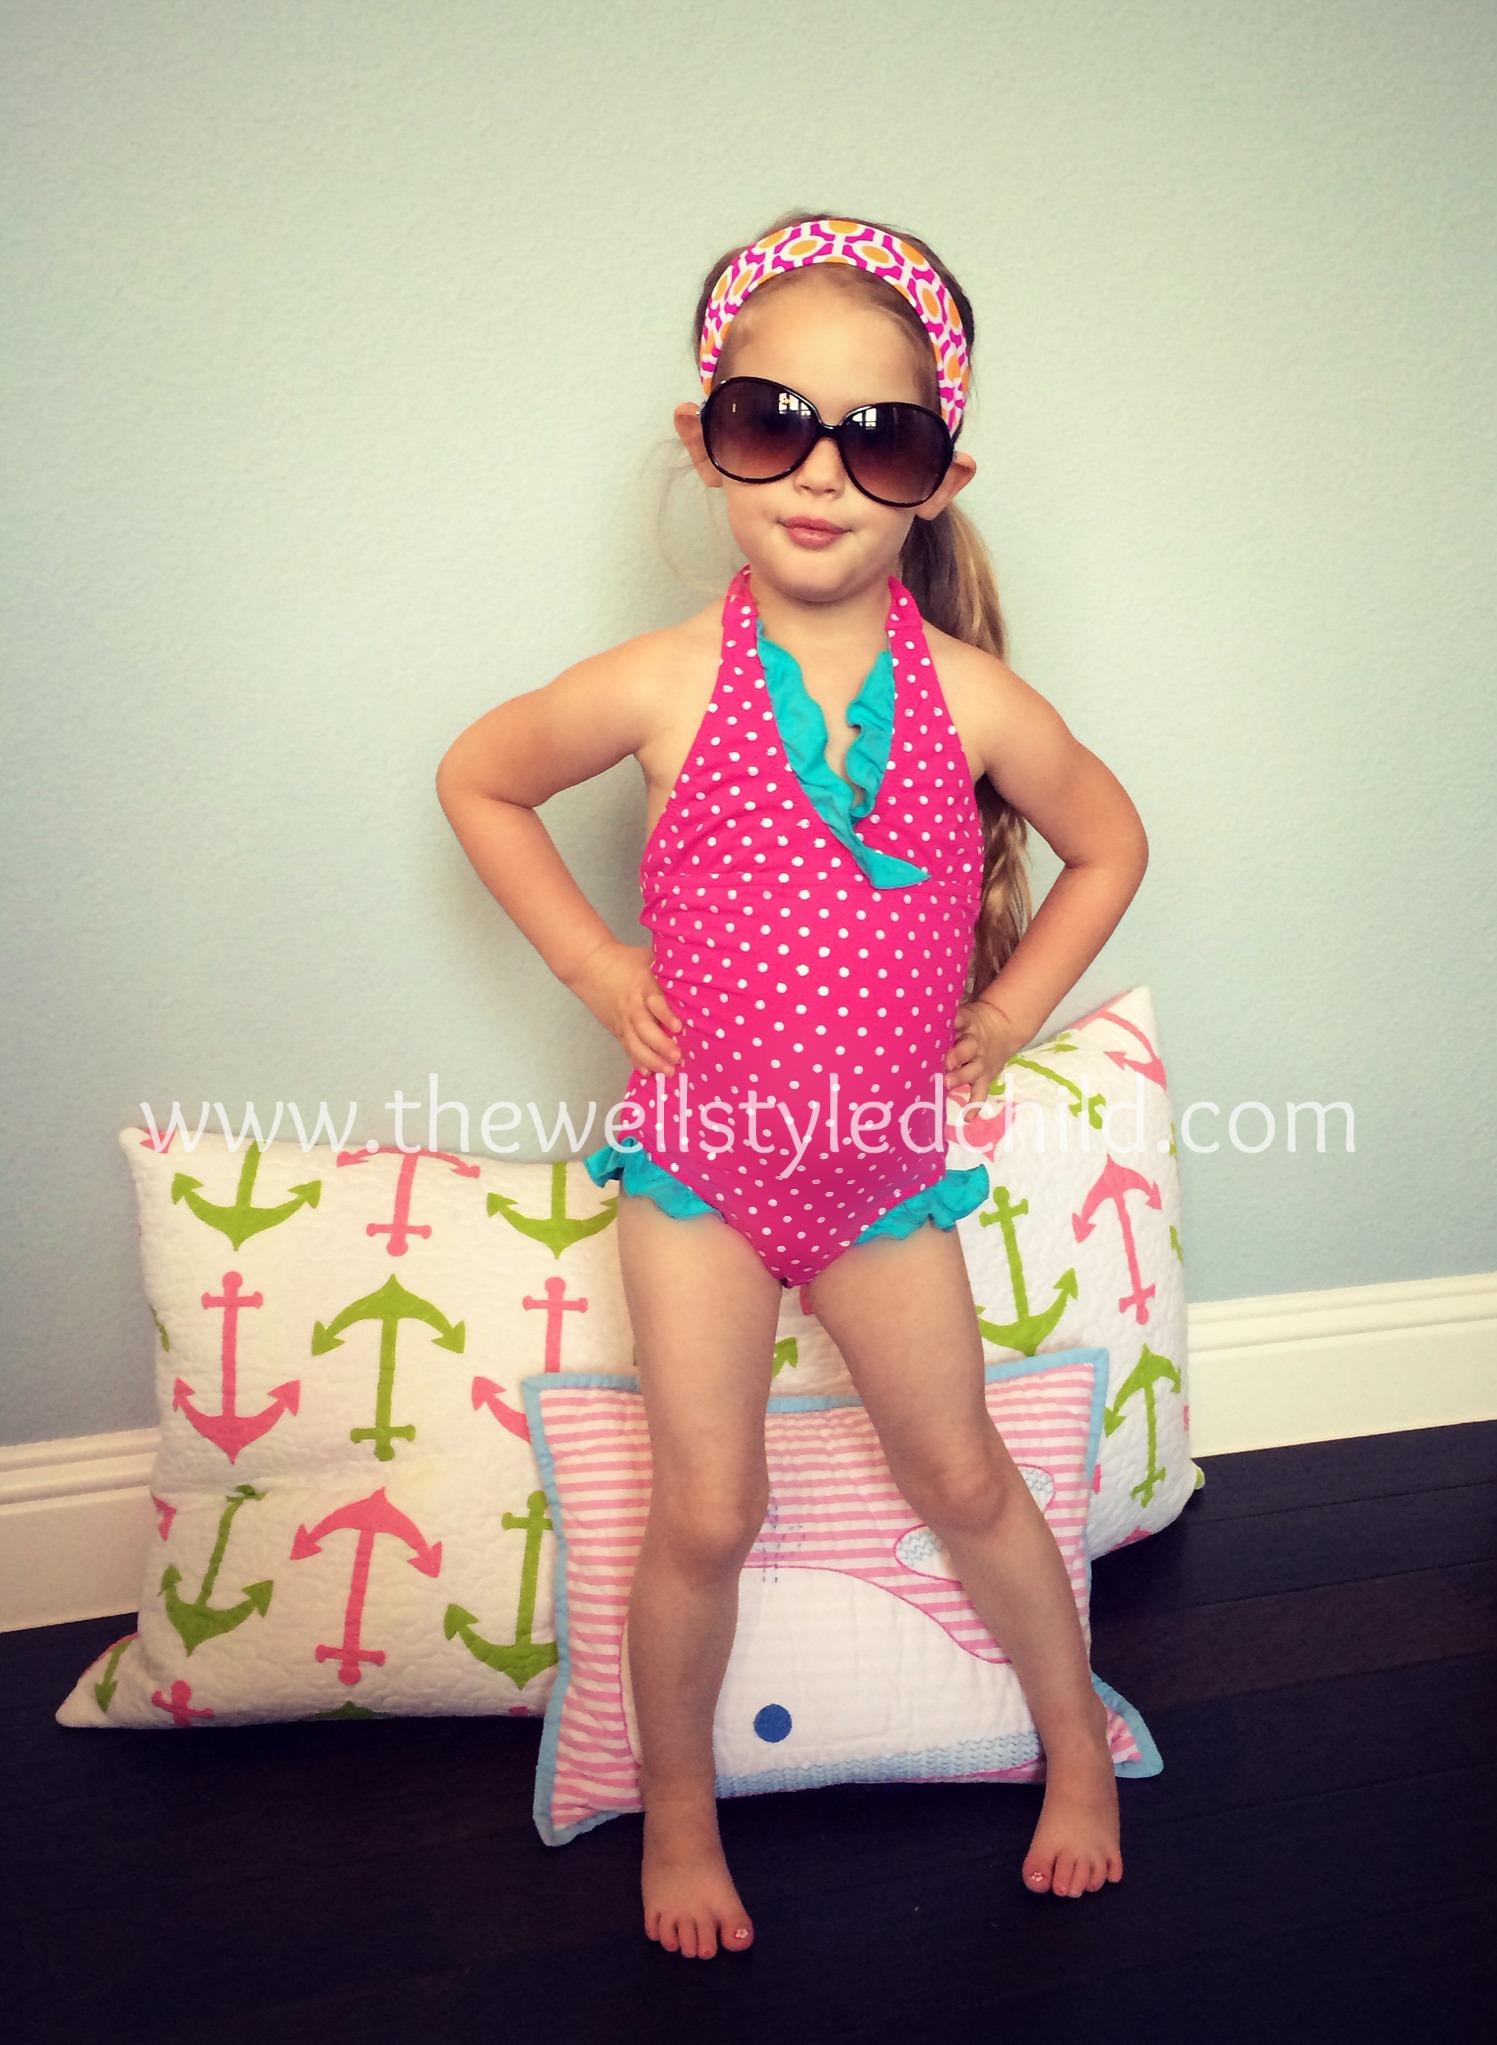 Garnet Hill Kids Ruffle Trimmed Halter One Piece  Garnet Hill Kids Swim Headband  Sunglasses: Island in the SUn